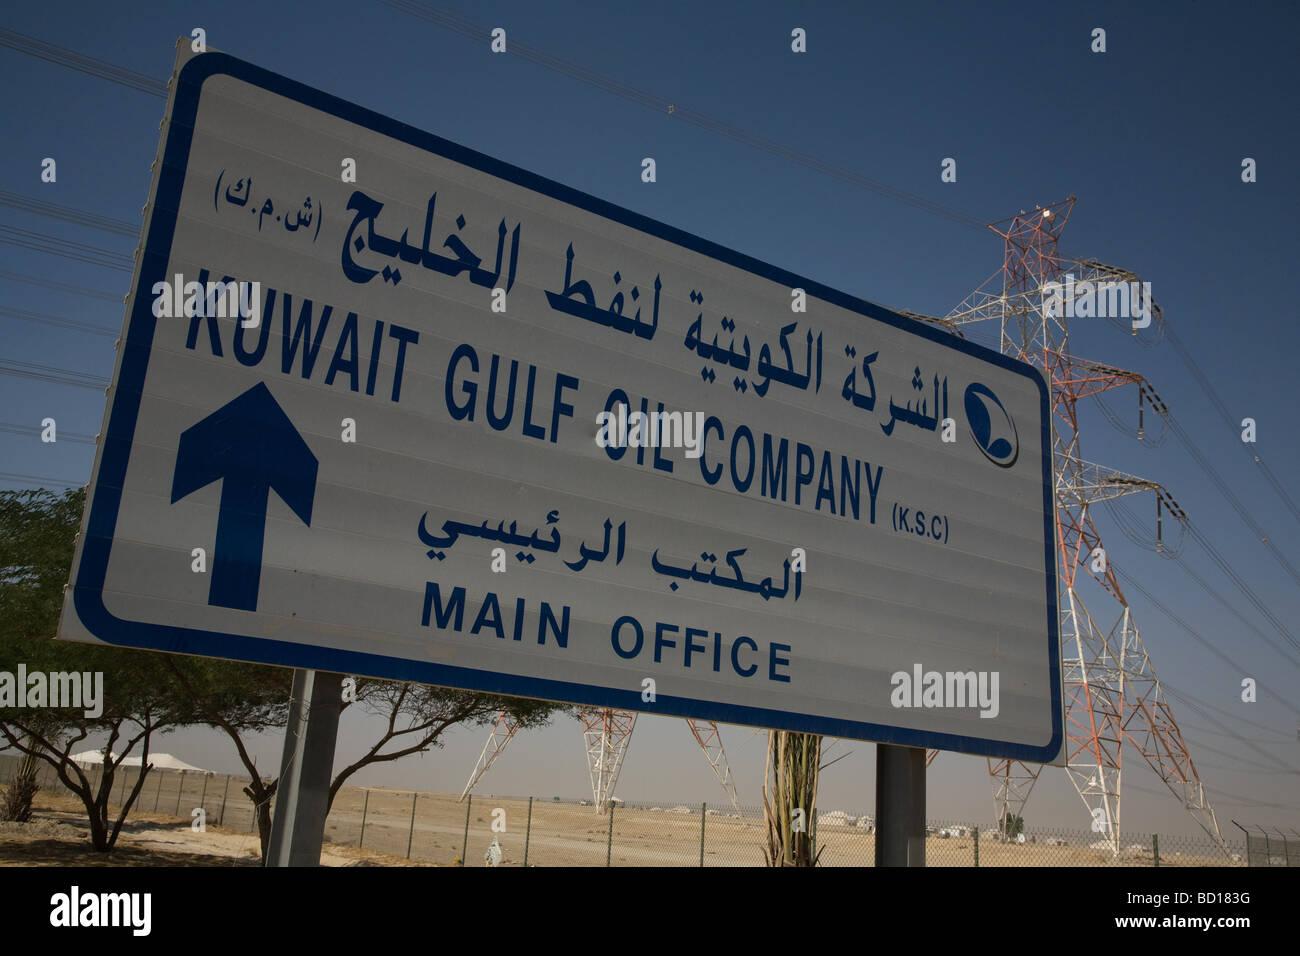 Kuwait Oil Company Logo Sign Logo Sign Stock Photo: 25229220 - Alamy